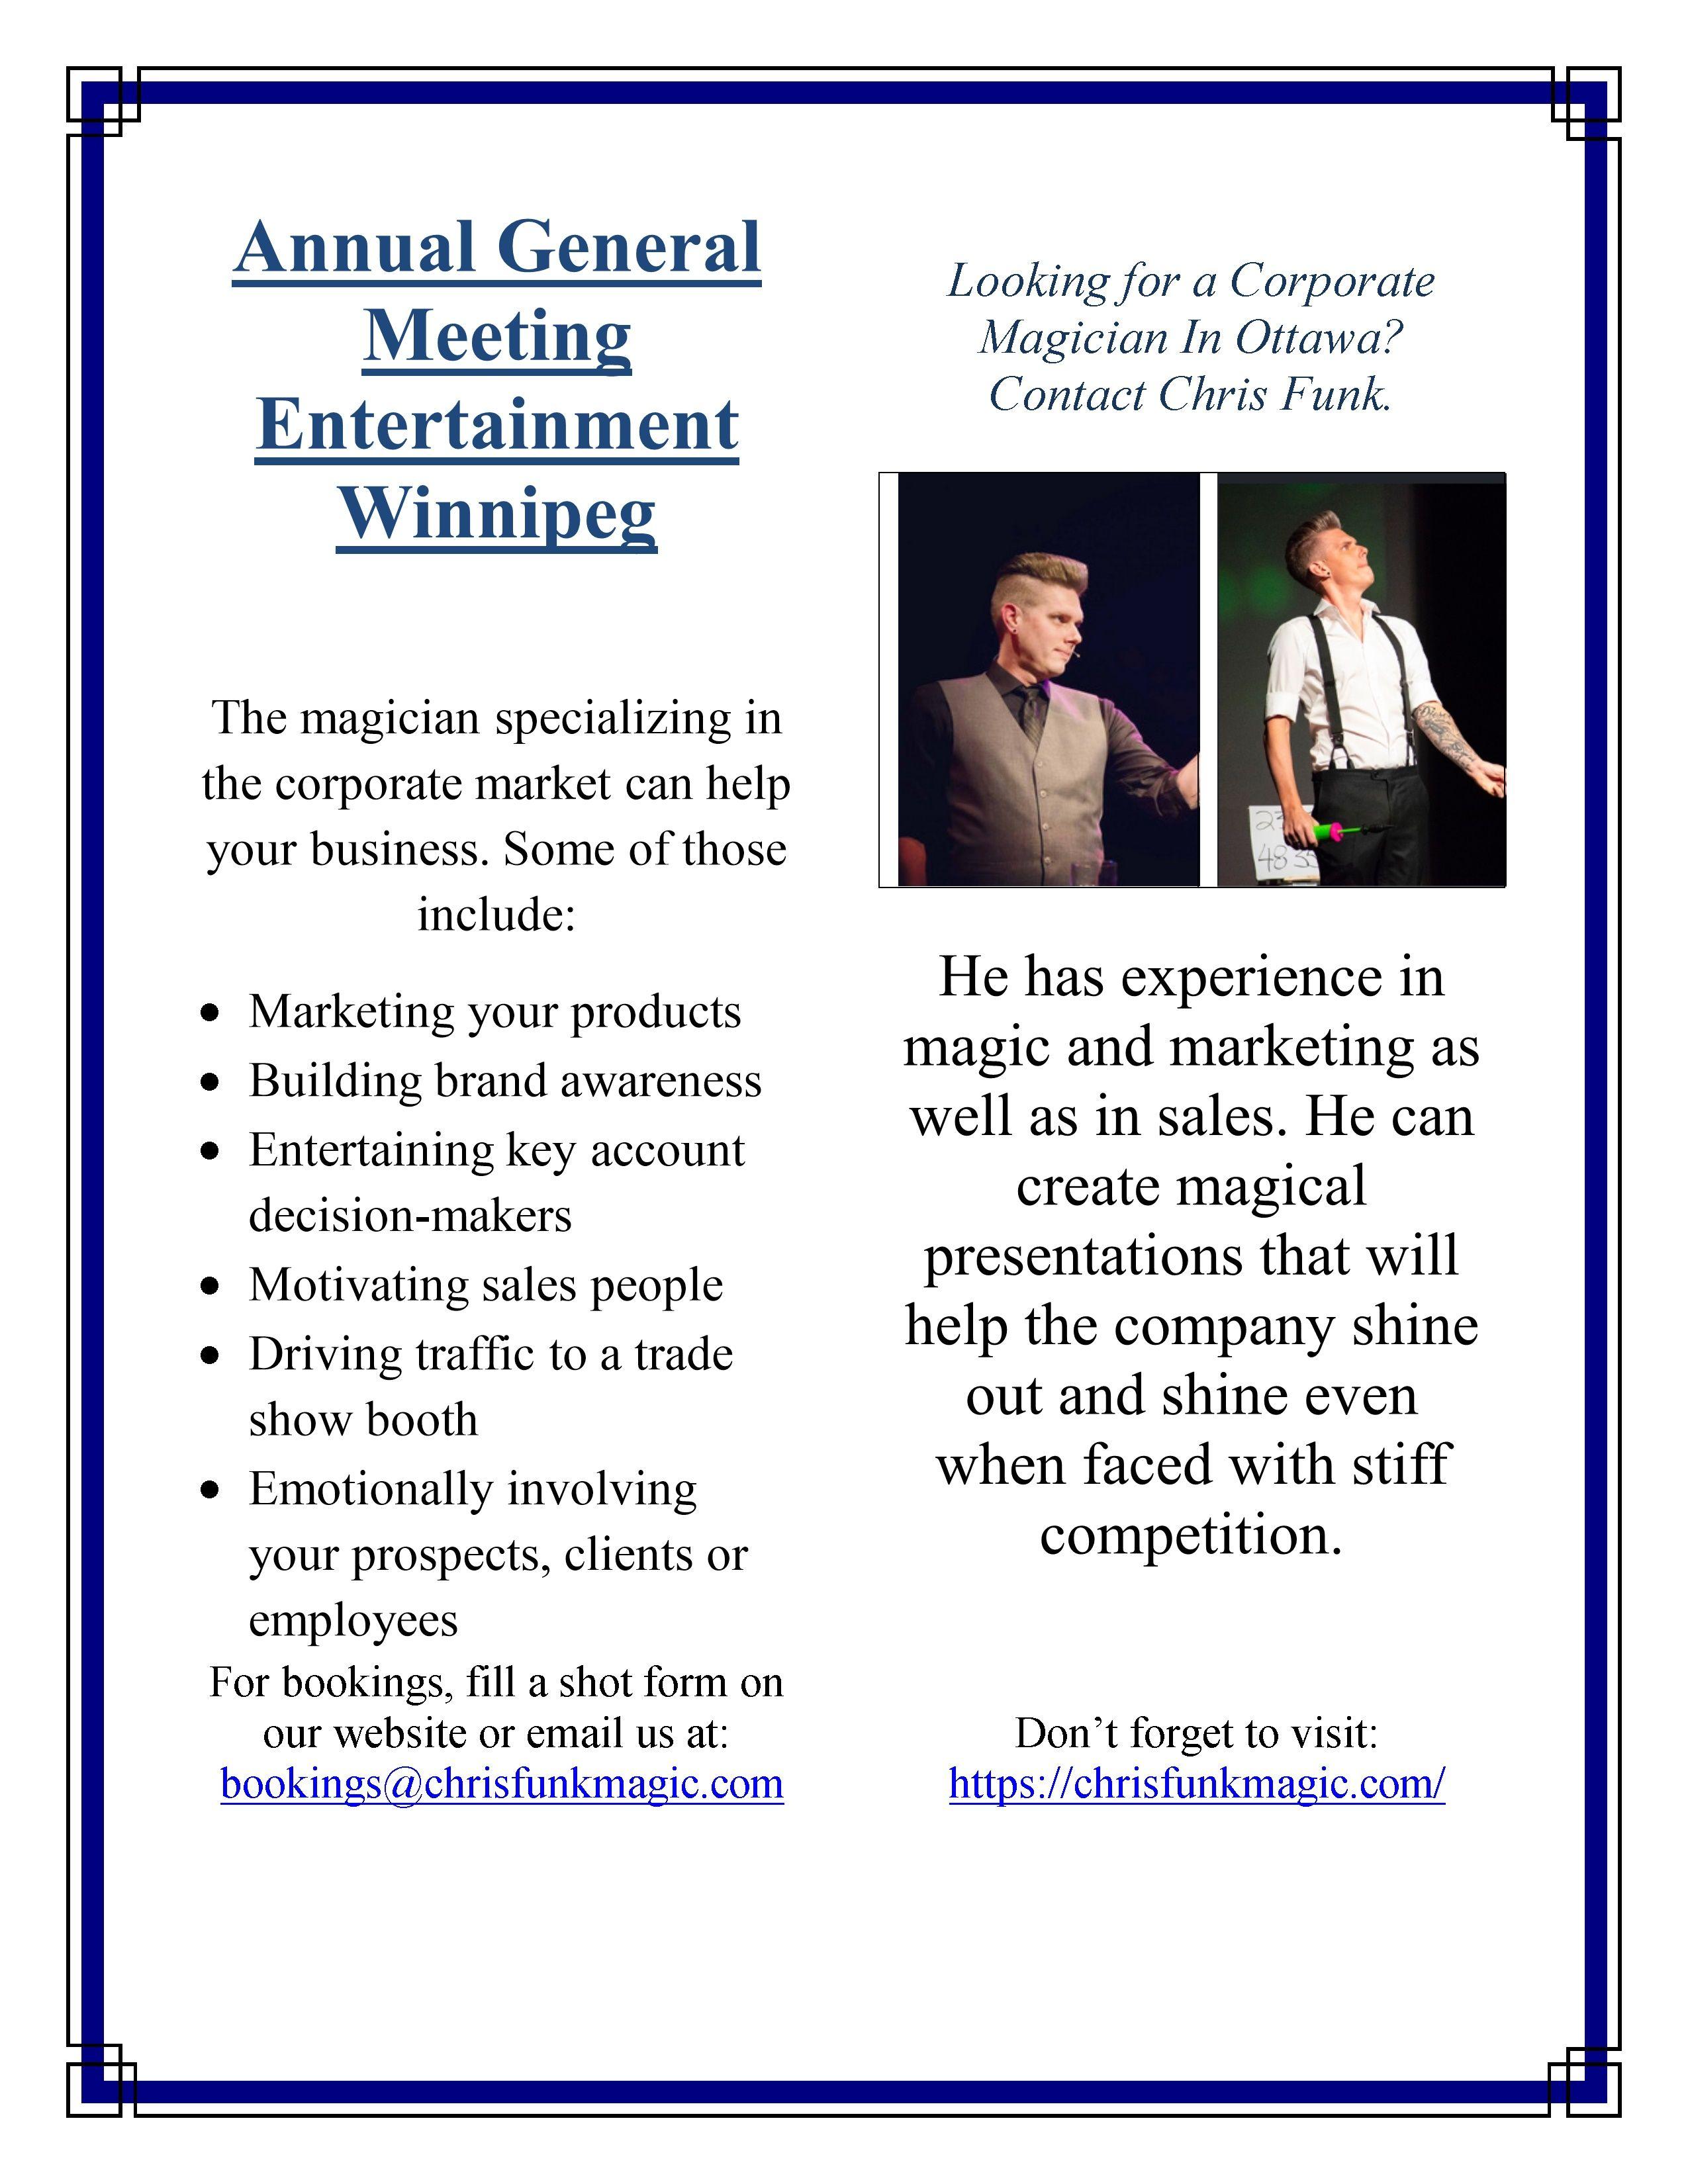 Pin On Annual General Meeting Entertainment Winnipeg